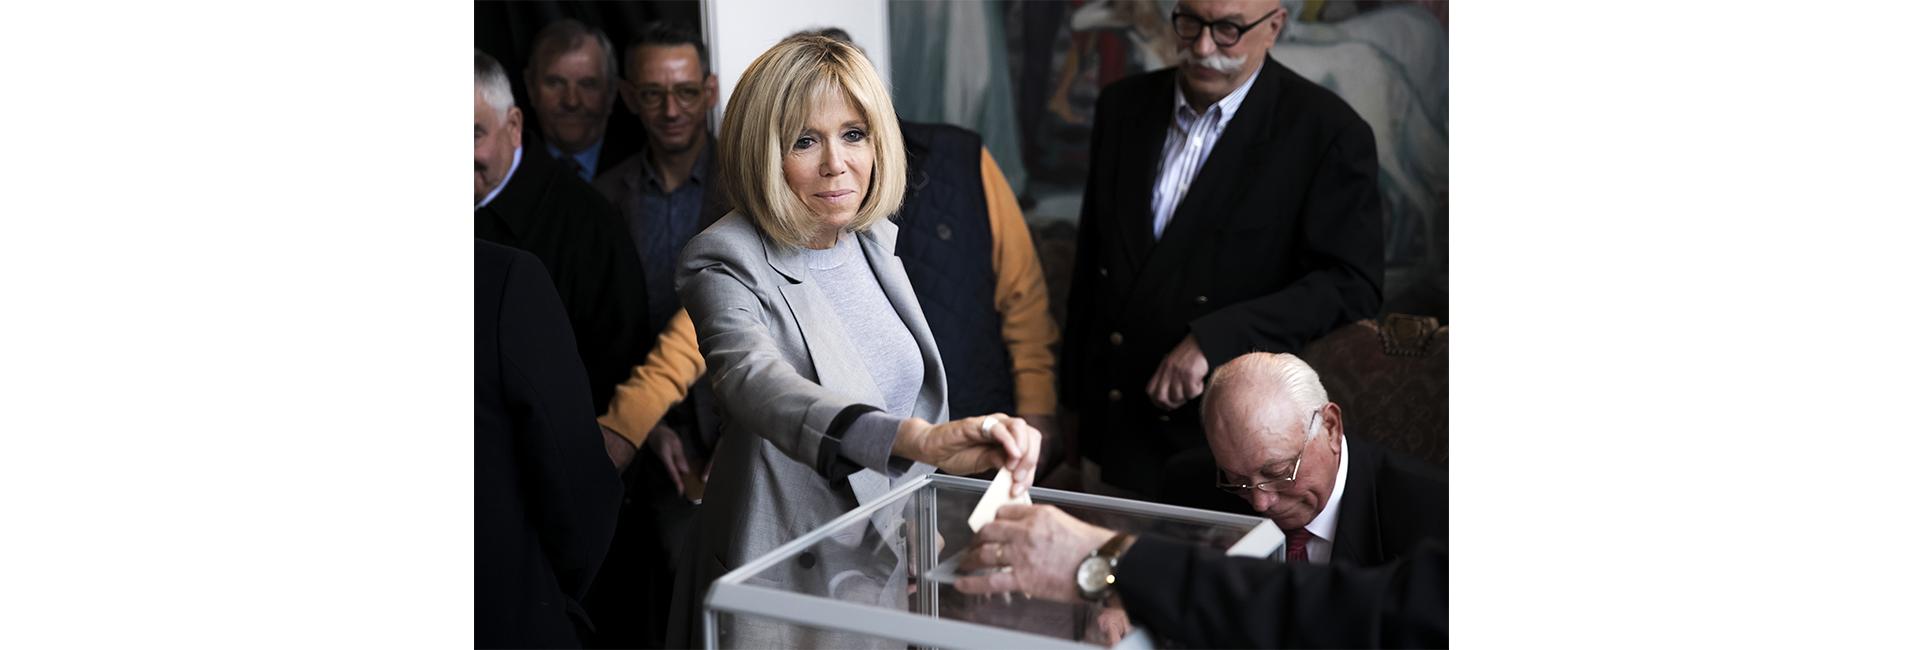 Кто такая Брижит Макрон — супруга нового президента Франции (фото 1)